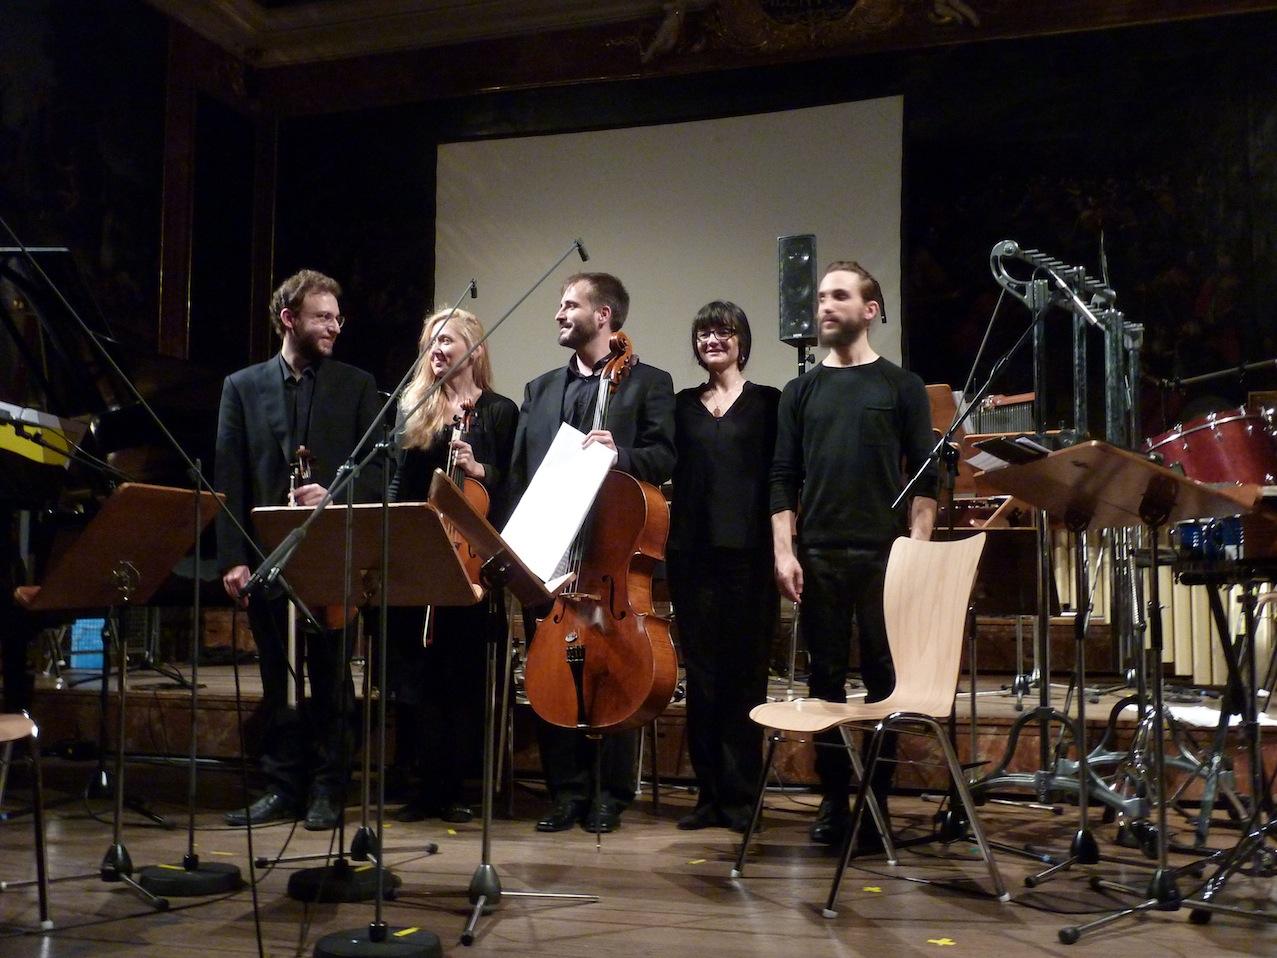 Lorenzo Derinni, Emilia Gladnischka, Esteban Belinchon, Maria Flavia Cerrato, Christian Pollheimer © D. Mayer